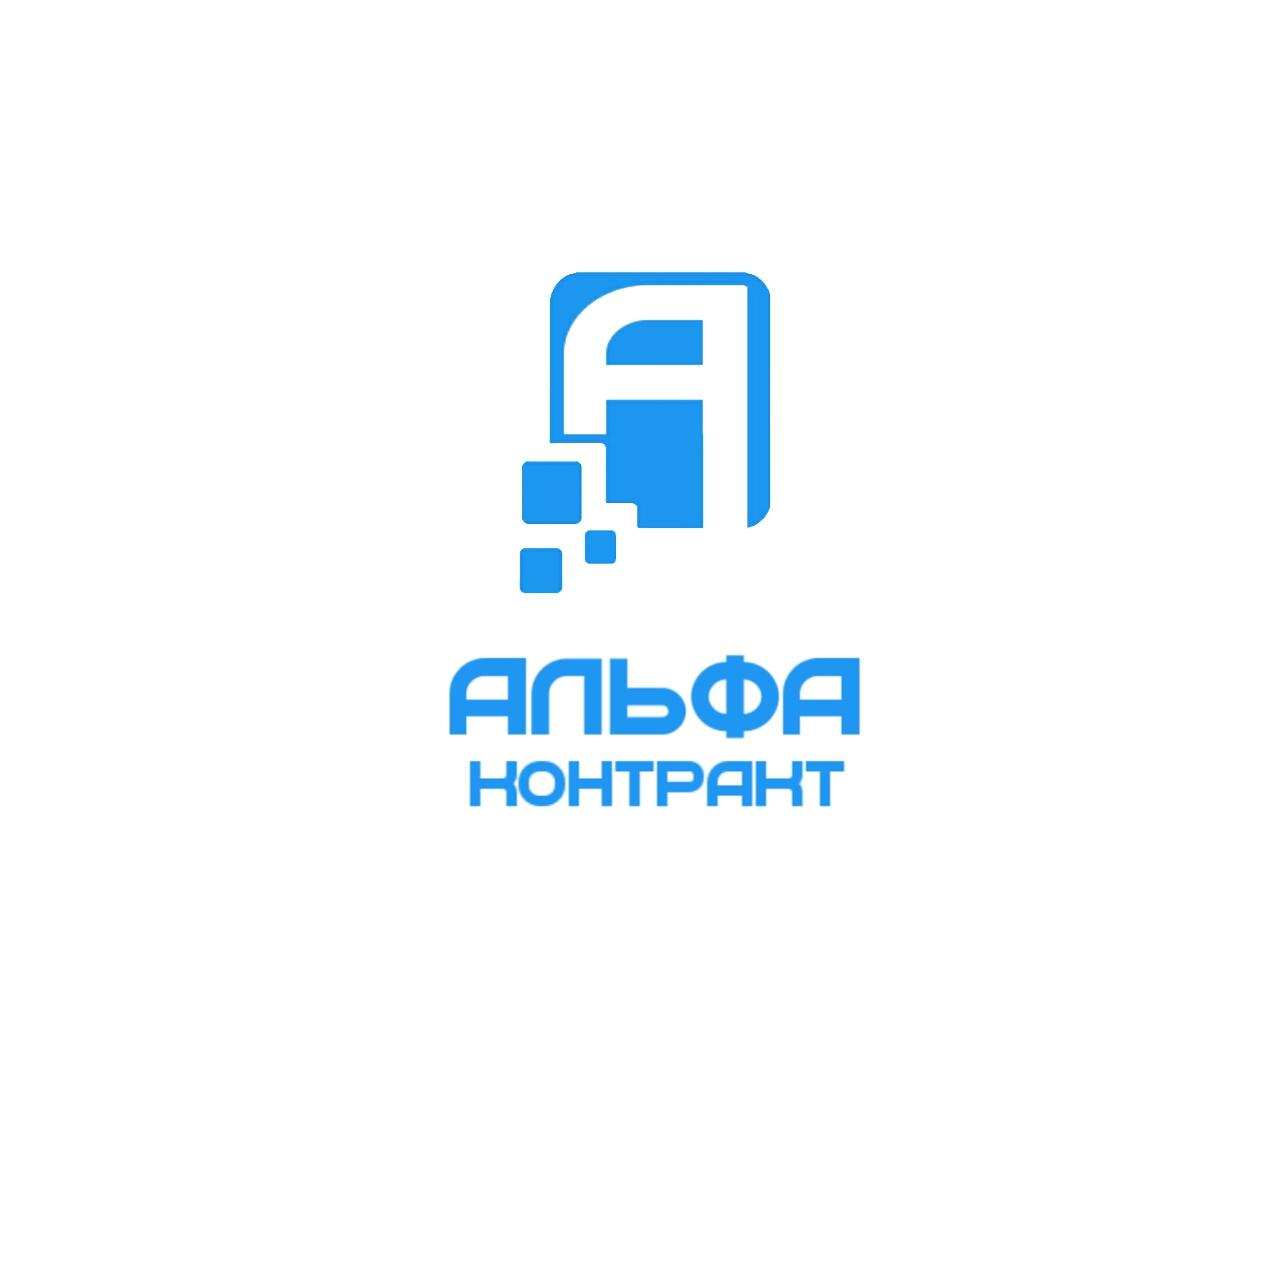 Дизайнер для разработки логотипа компании фото f_3865bfade9aa34cc.jpg